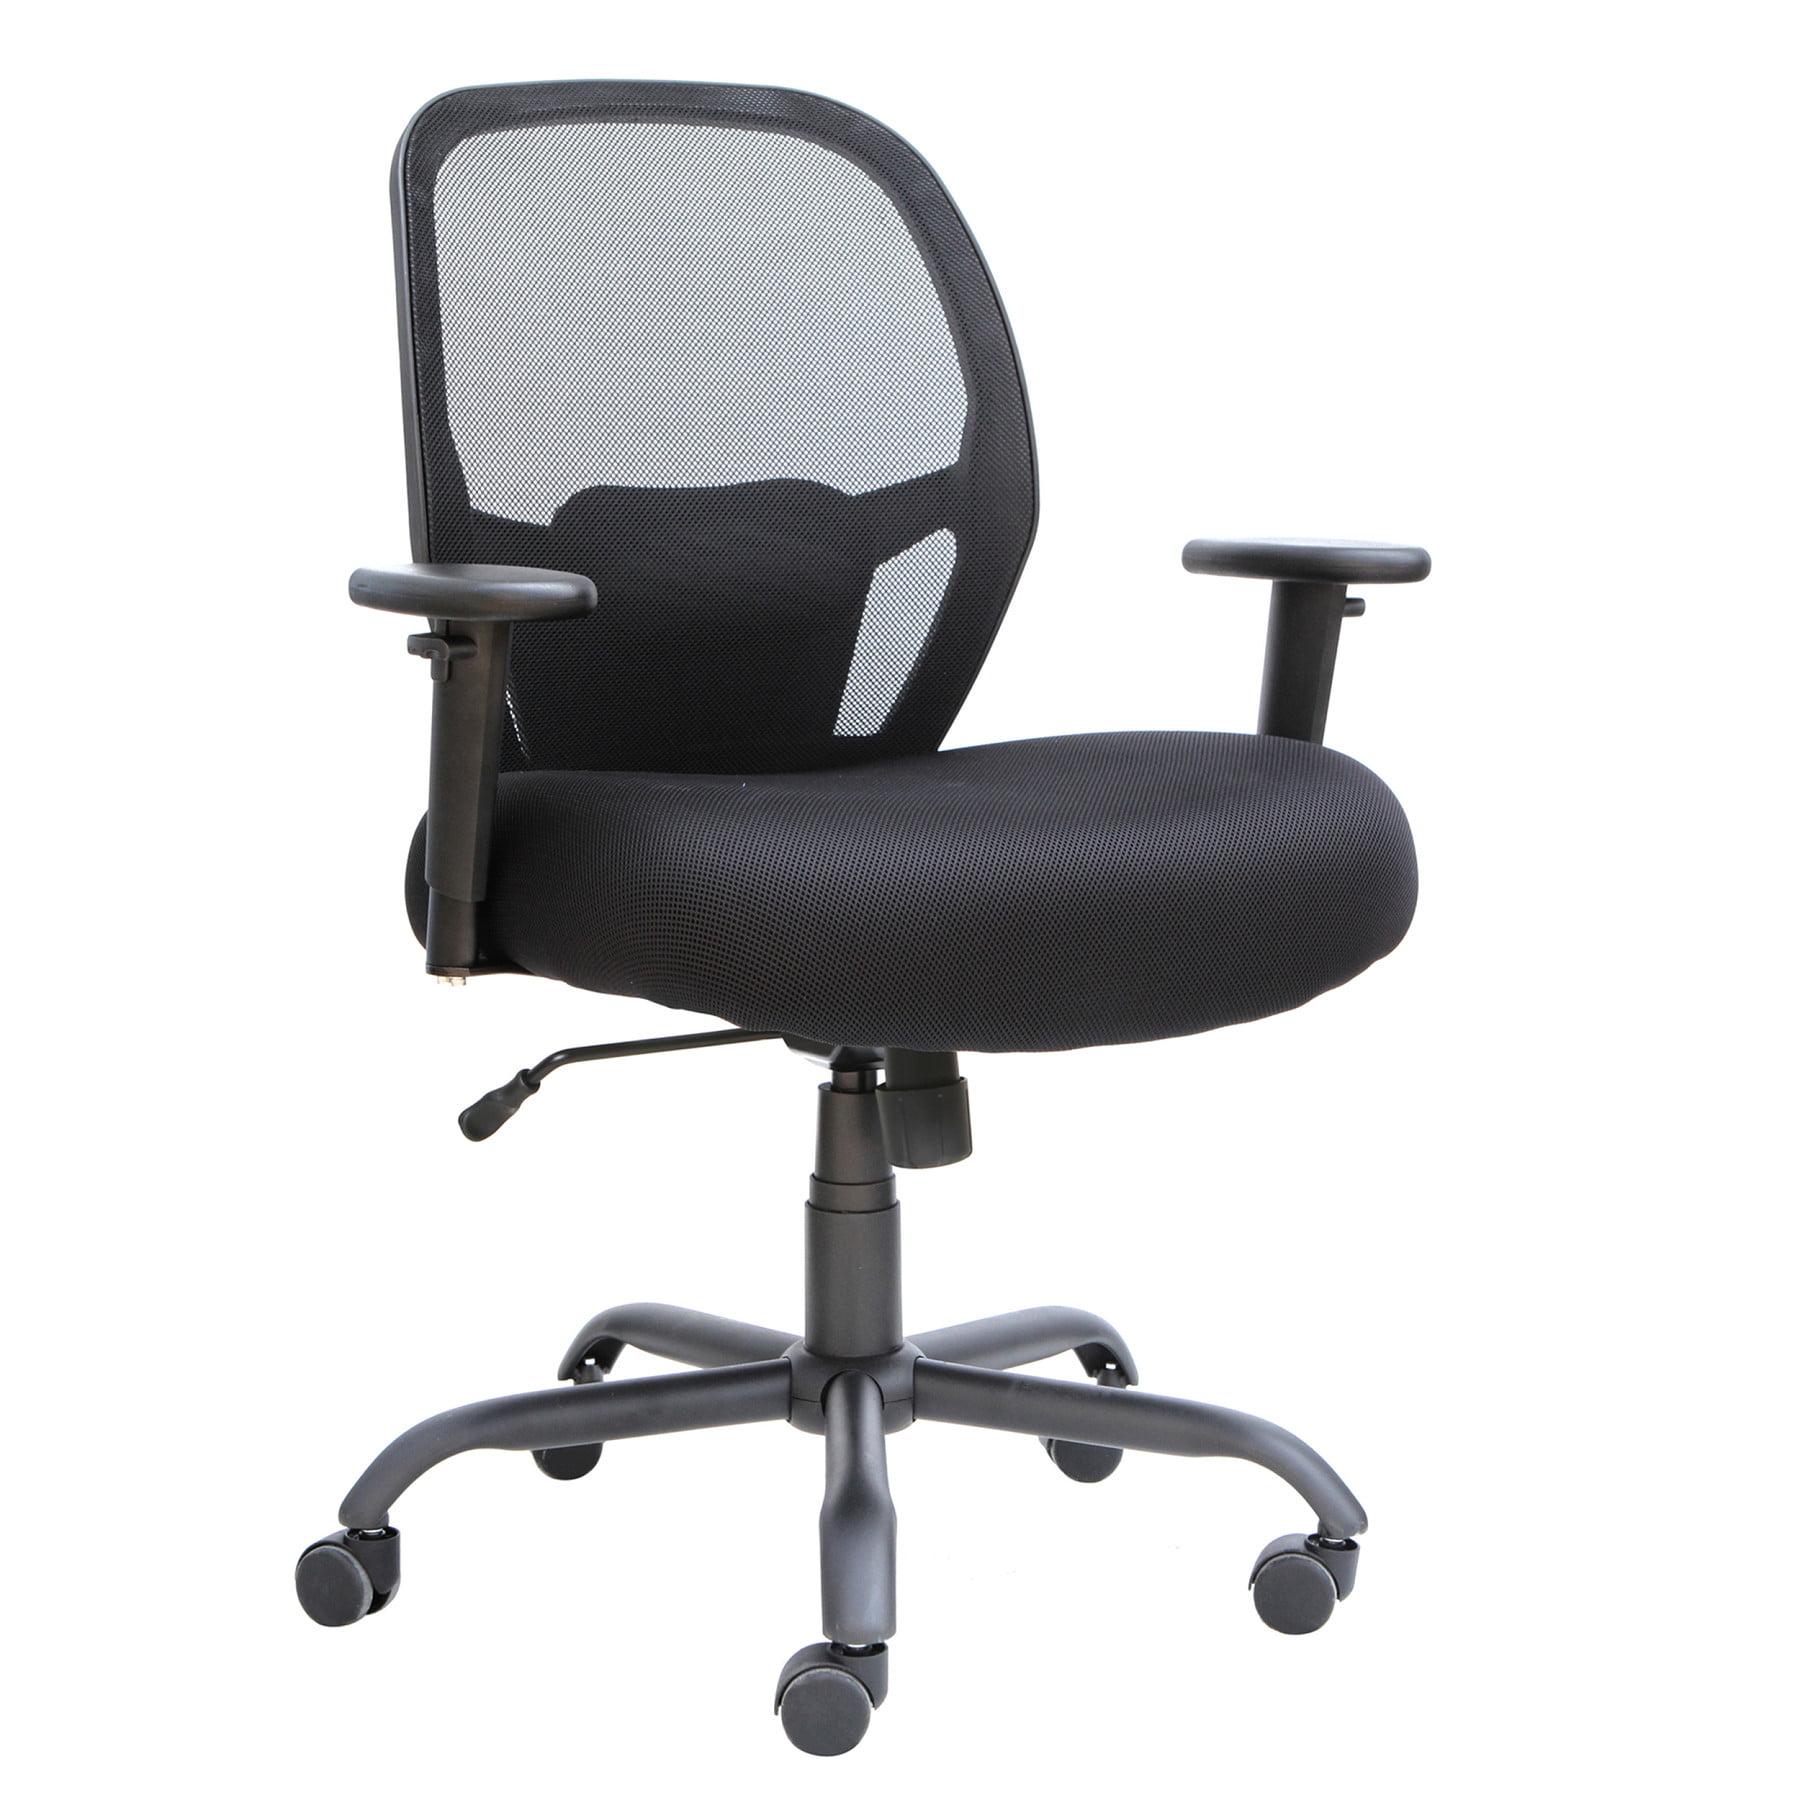 Alera Alera Merix Series Mesh Big/Tall Mid-Back Swivel/Tilt Chair, Black